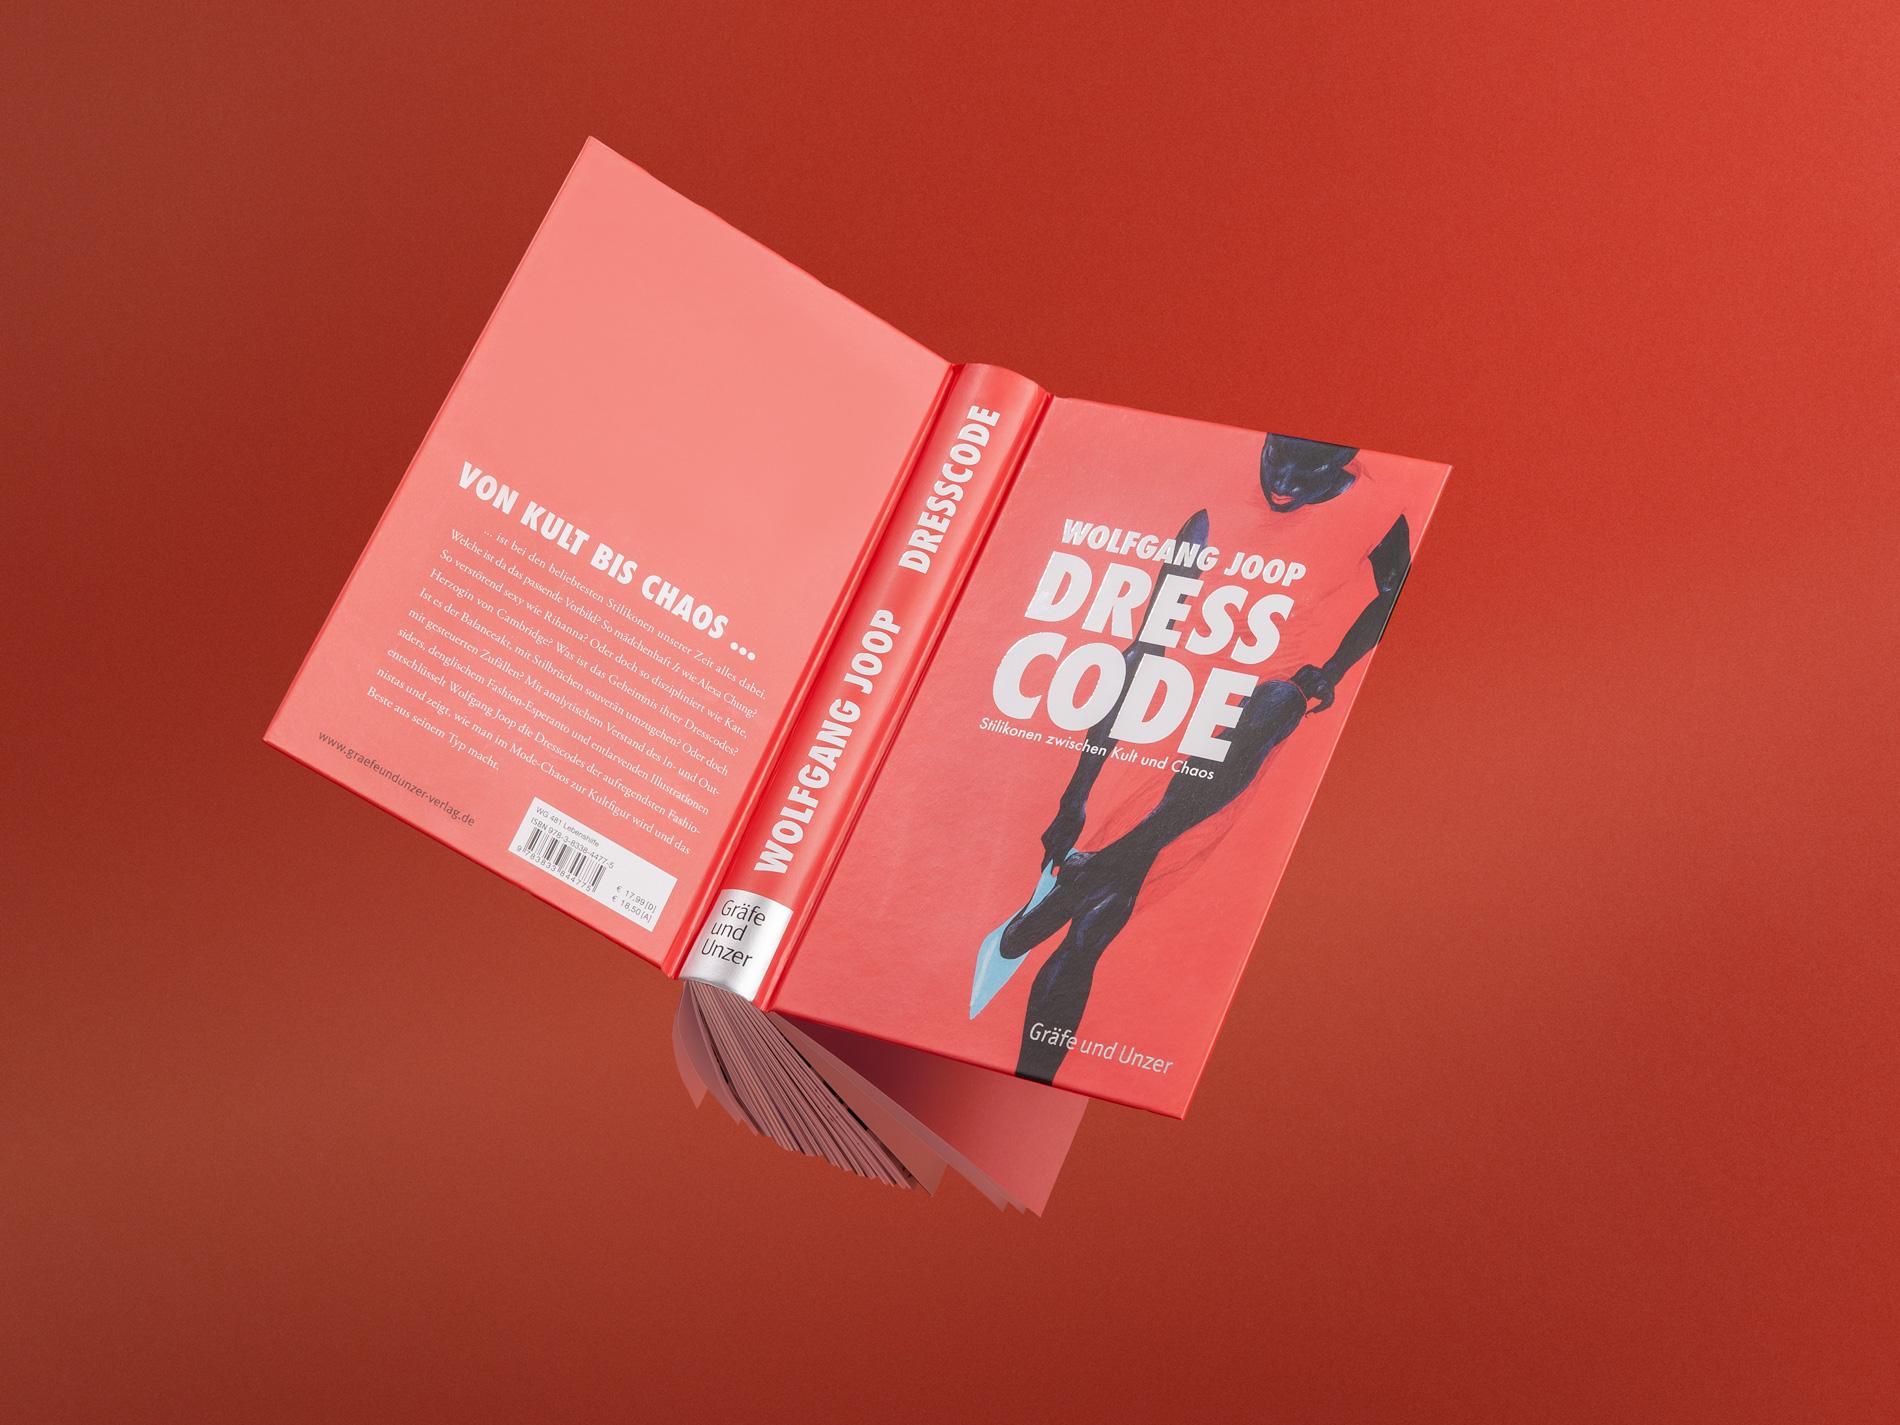 Dresscode |Wolfgang Joop